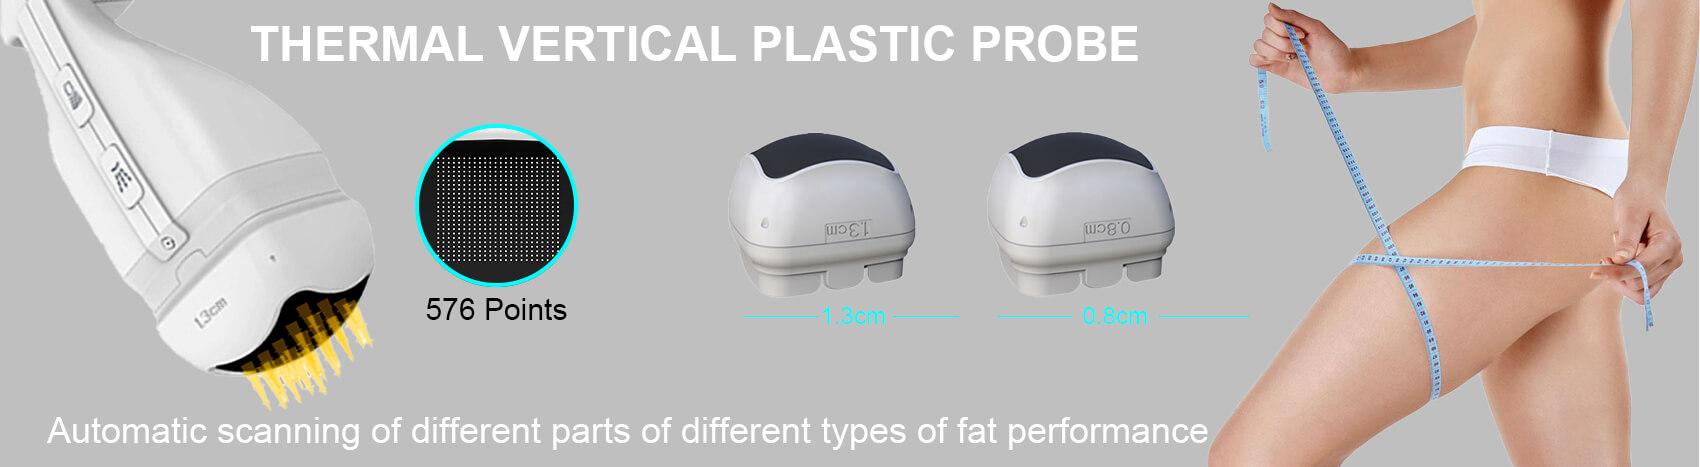 THERMAL VERTICAL PLASTIC PROBE